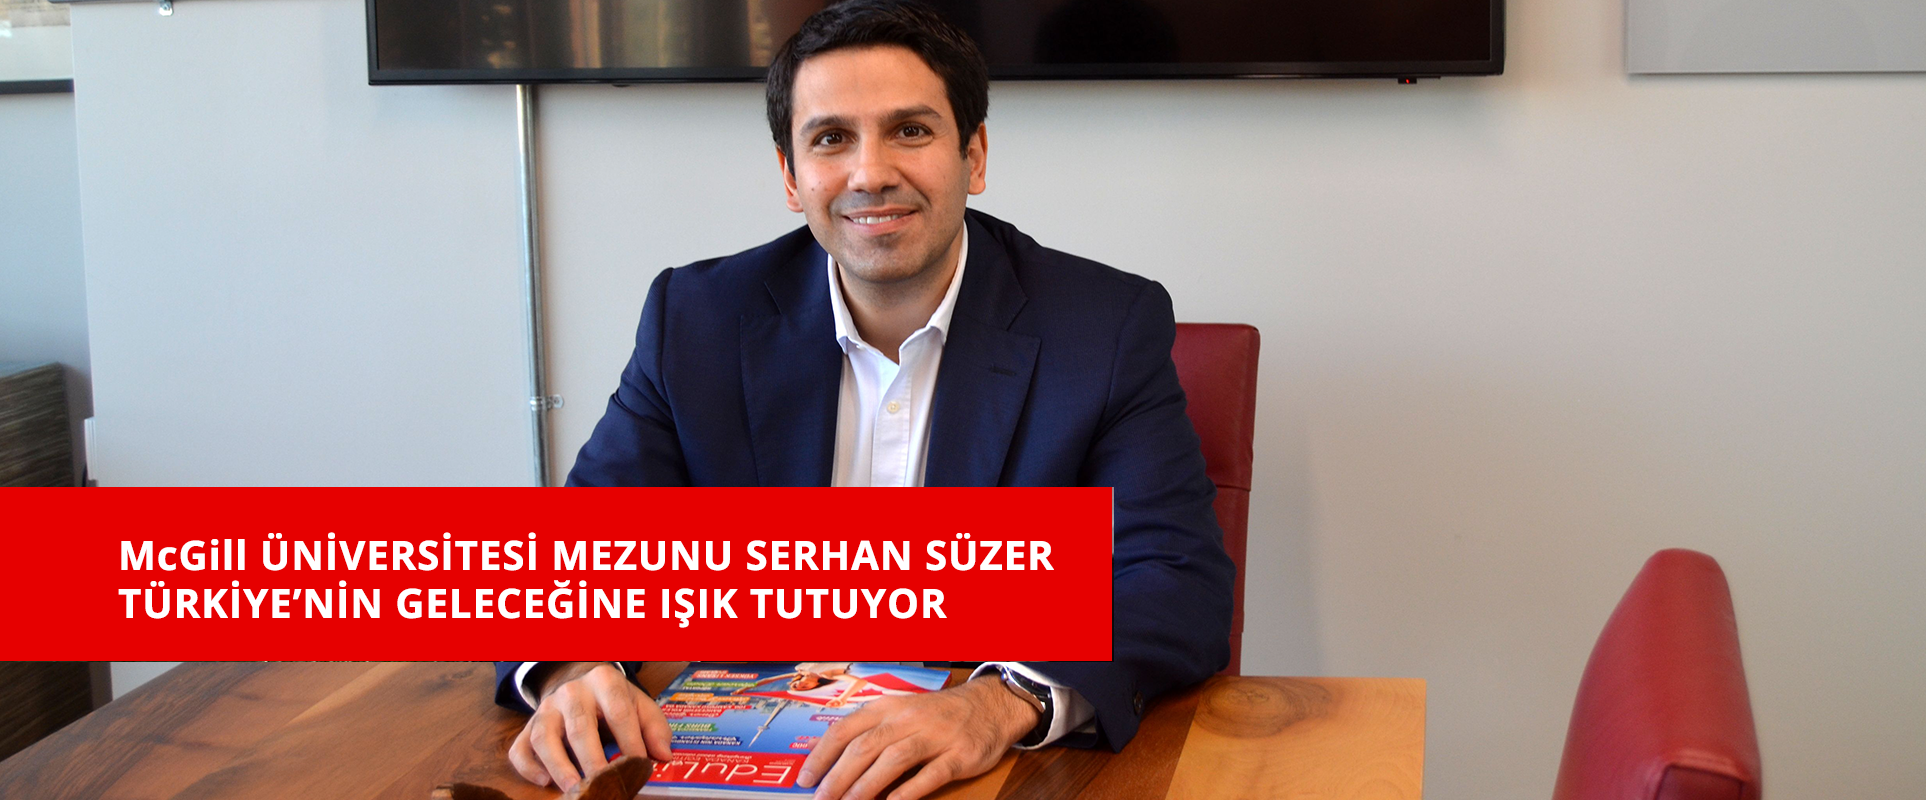 serhan_suzer